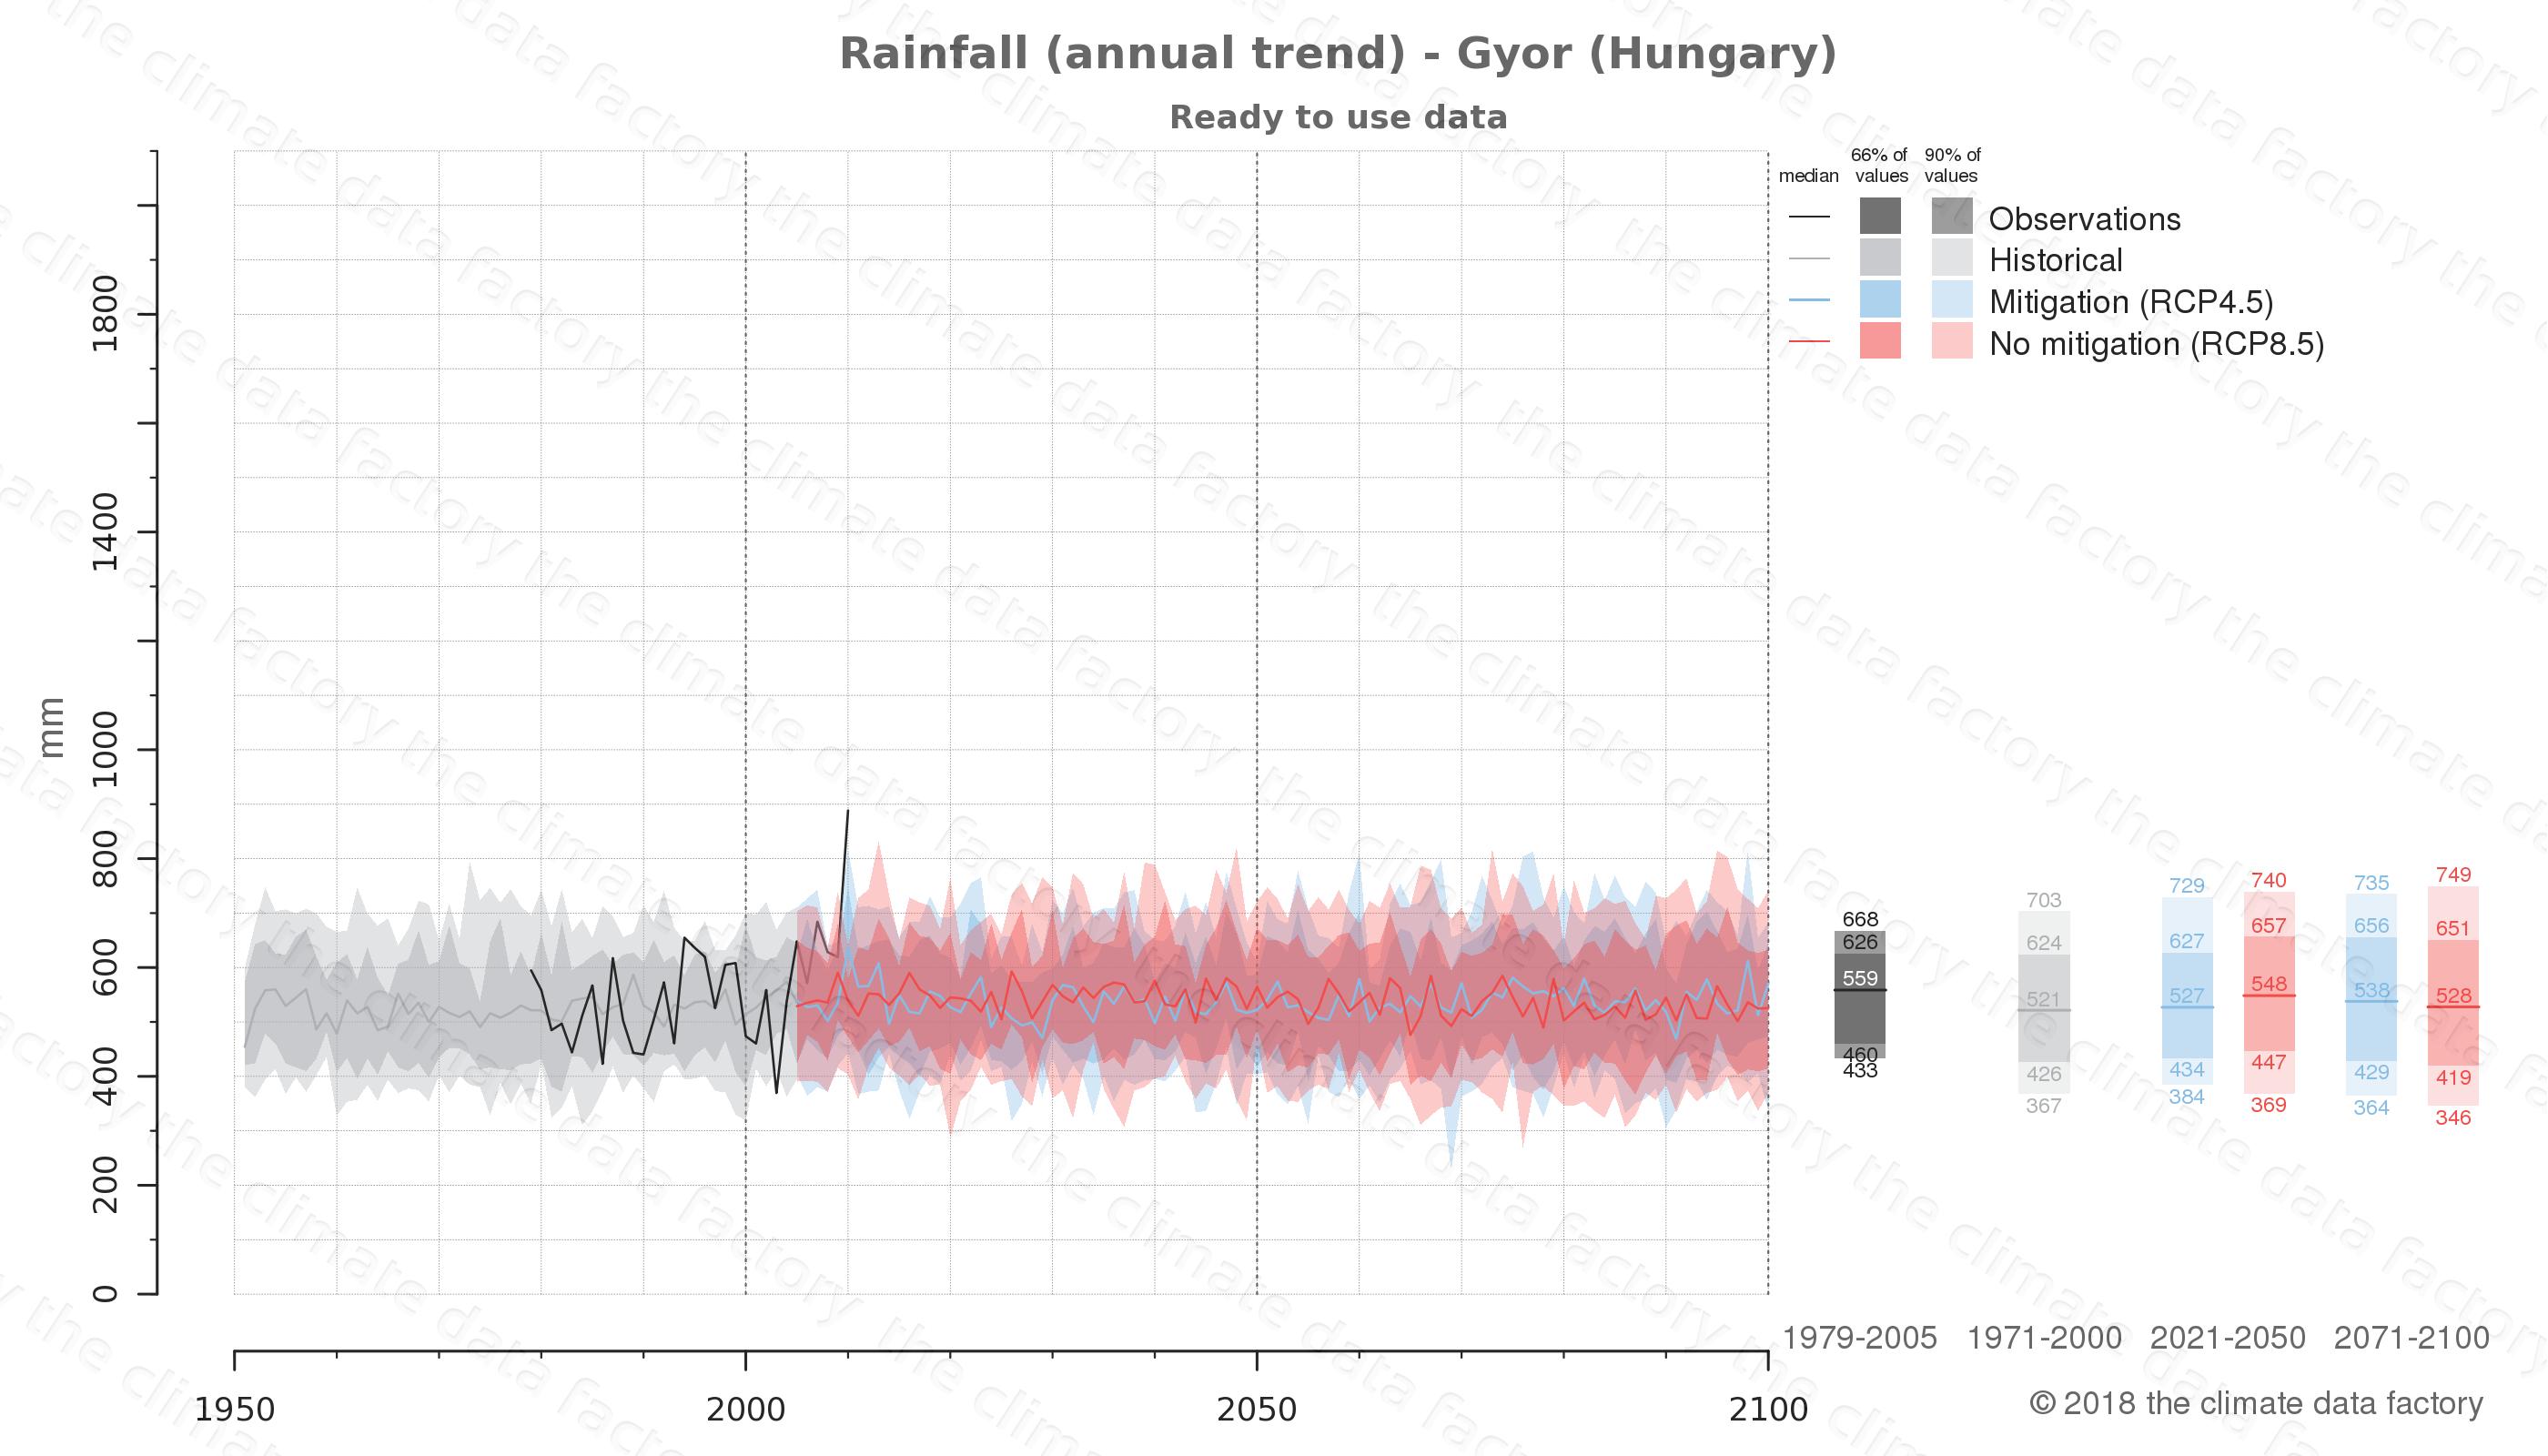 climate change data policy adaptation climate graph city data rainfall gyor hungary